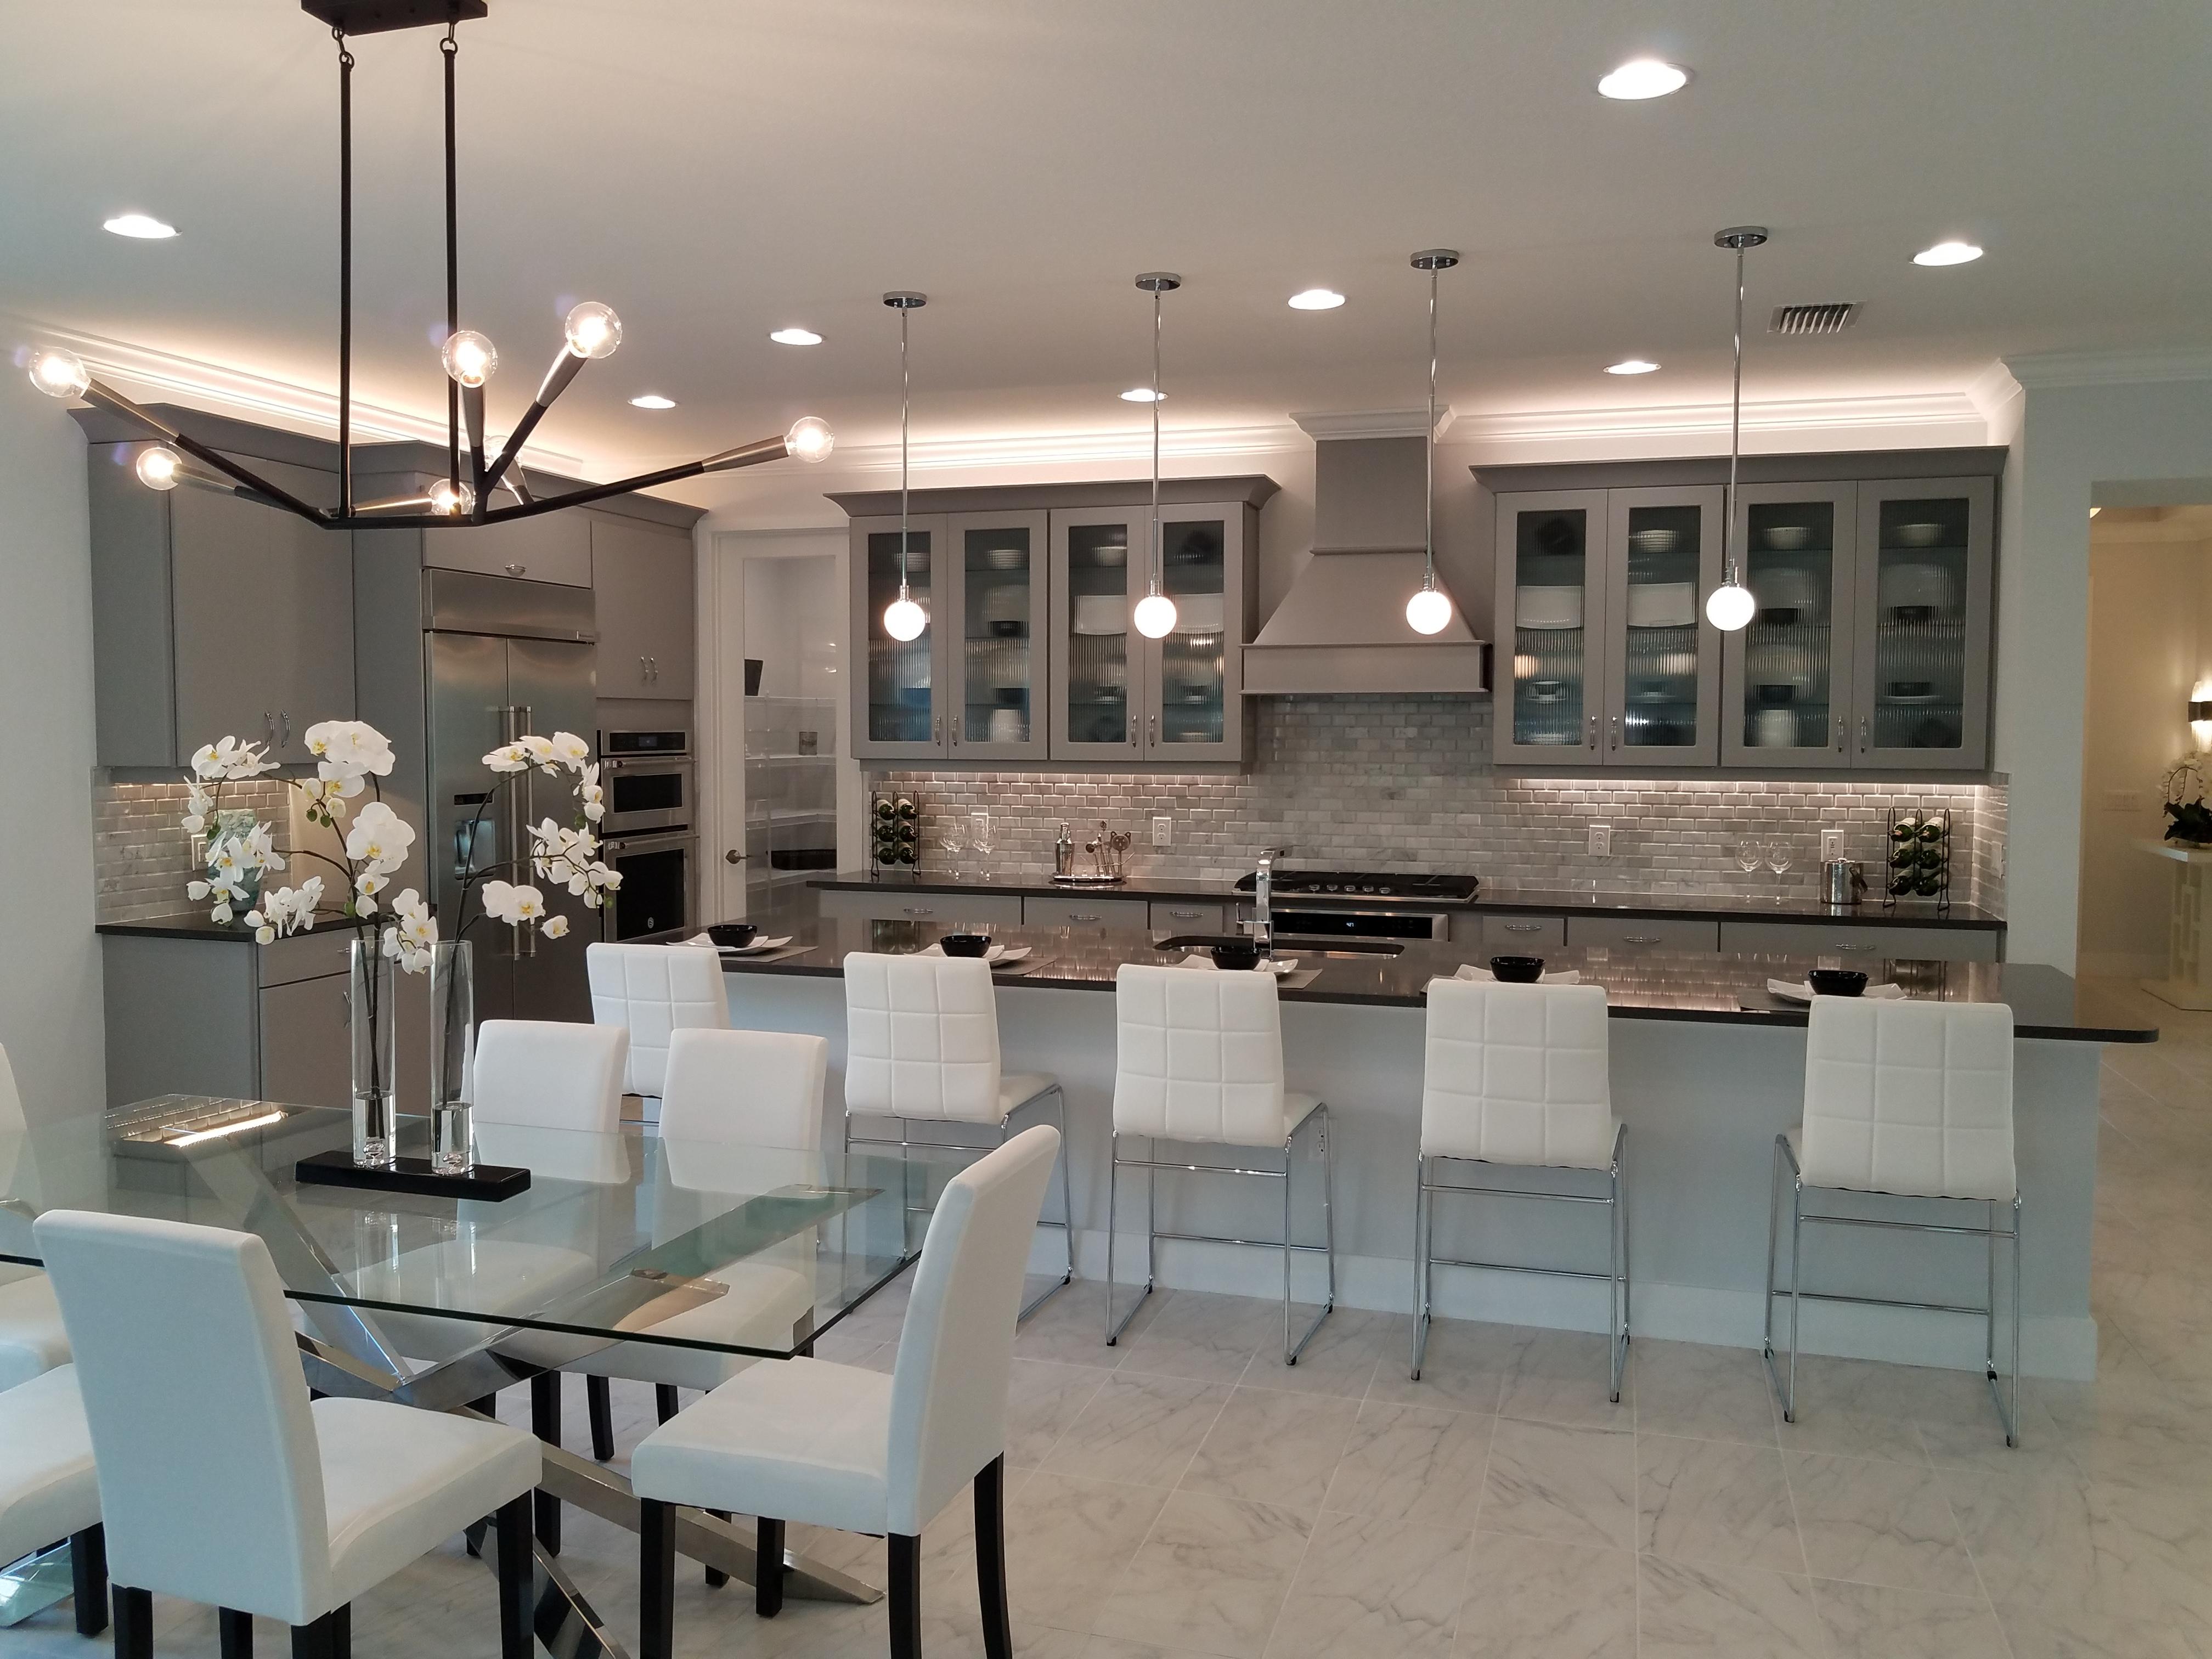 Sunrise Preserve Dayspring kitchen